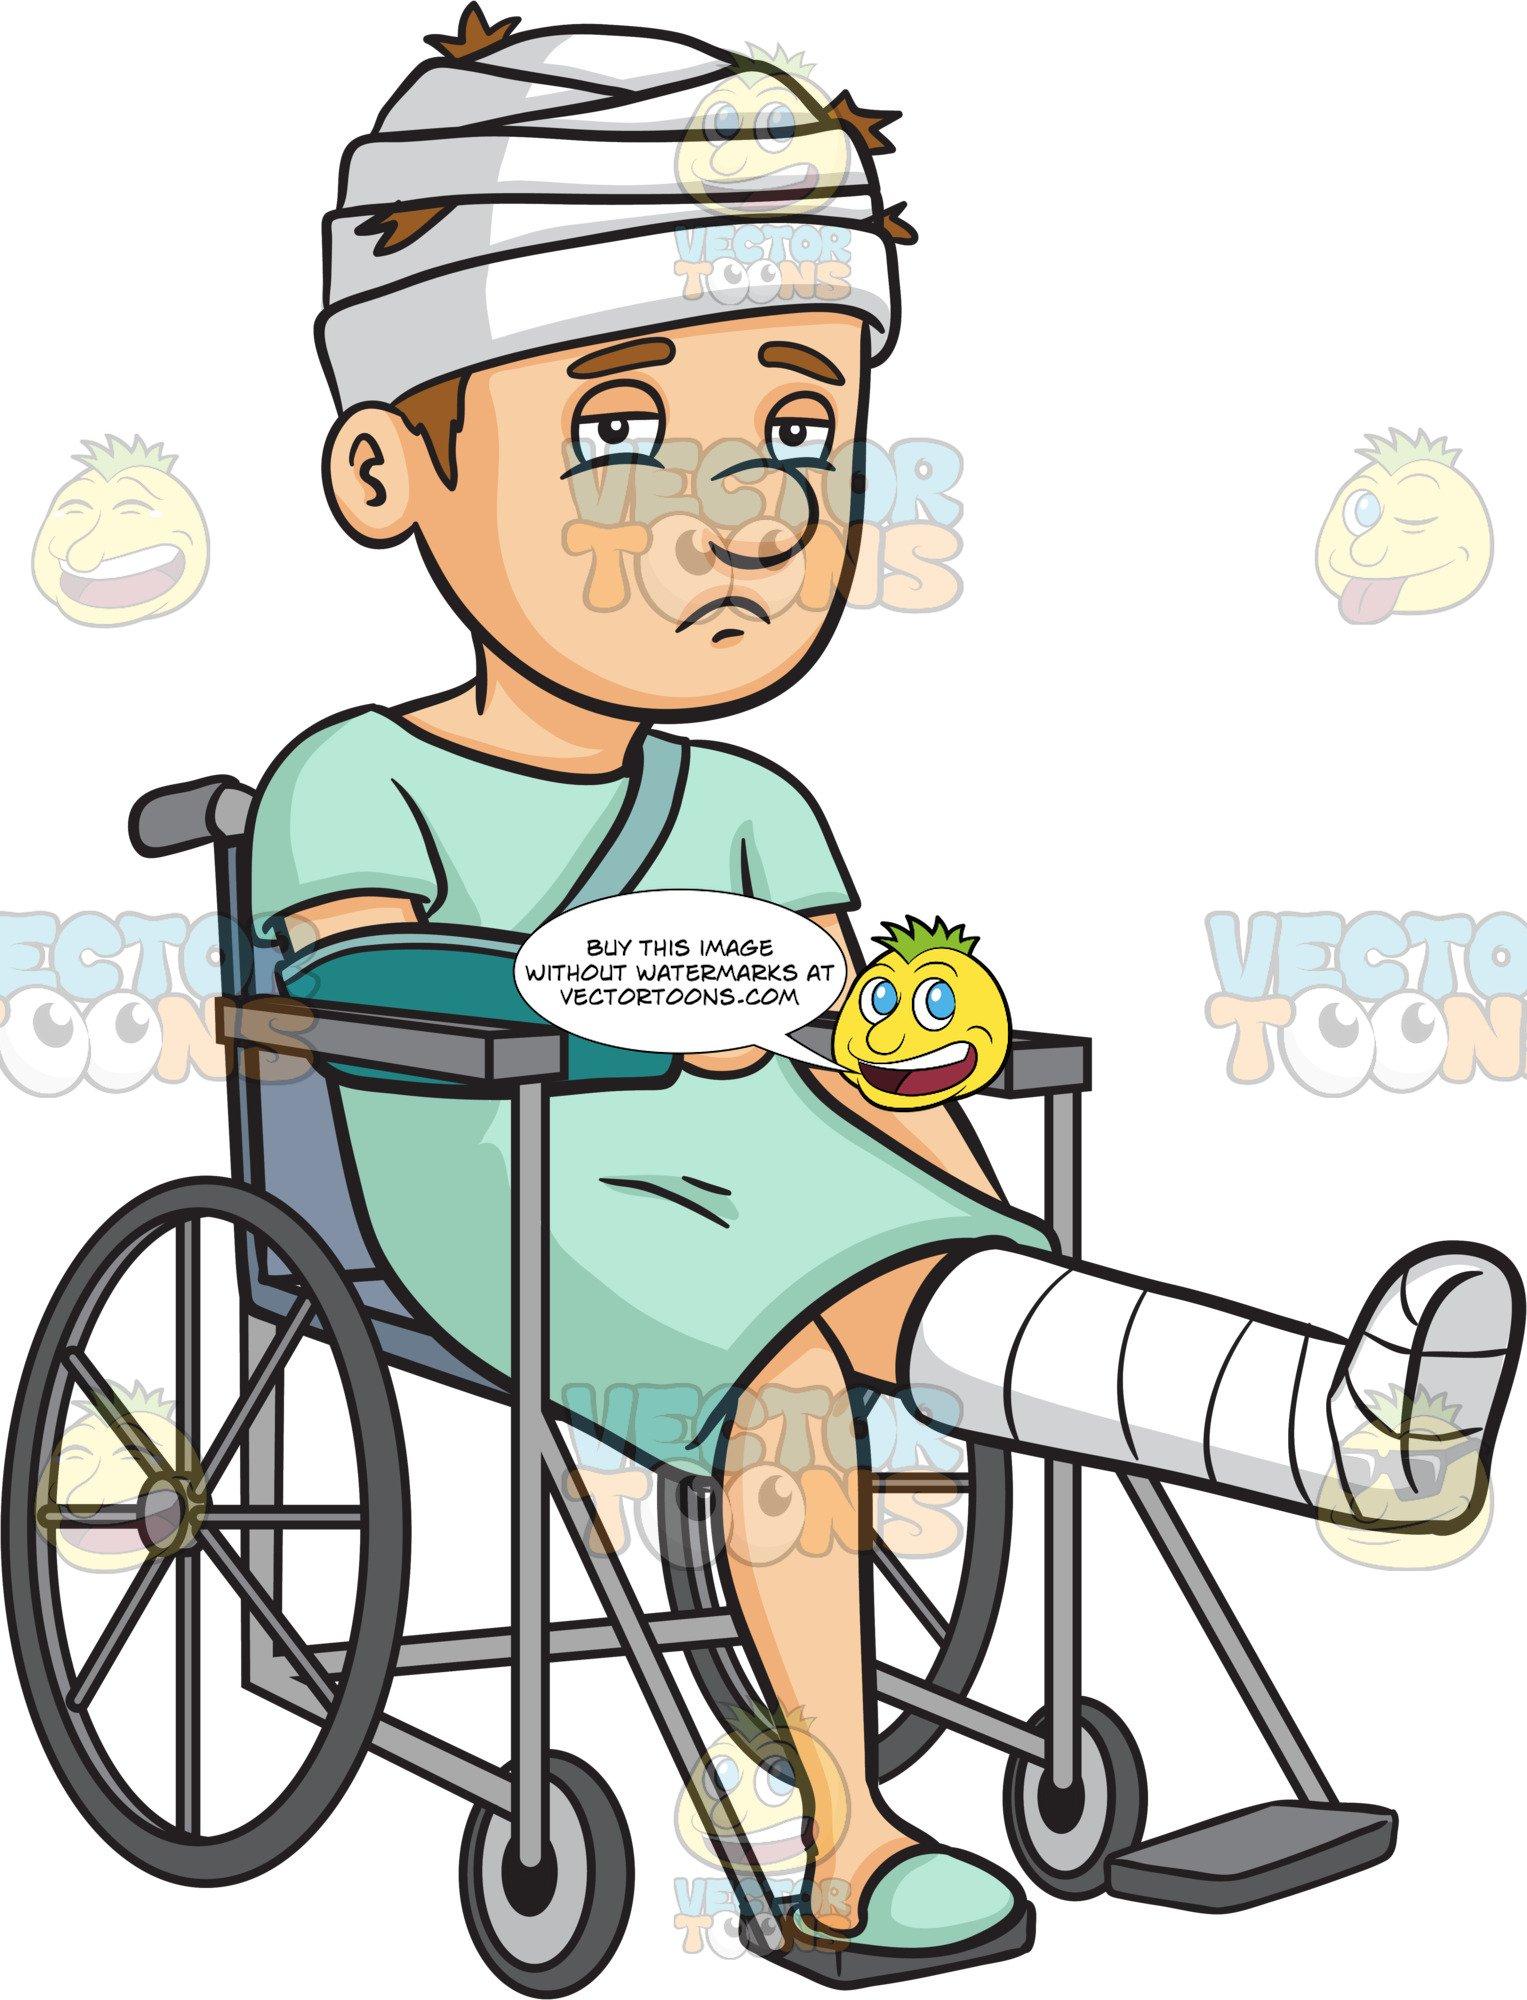 Clipart injured person clip art transparent stock A Sad Injured Man In A Wheelchair clip art transparent stock